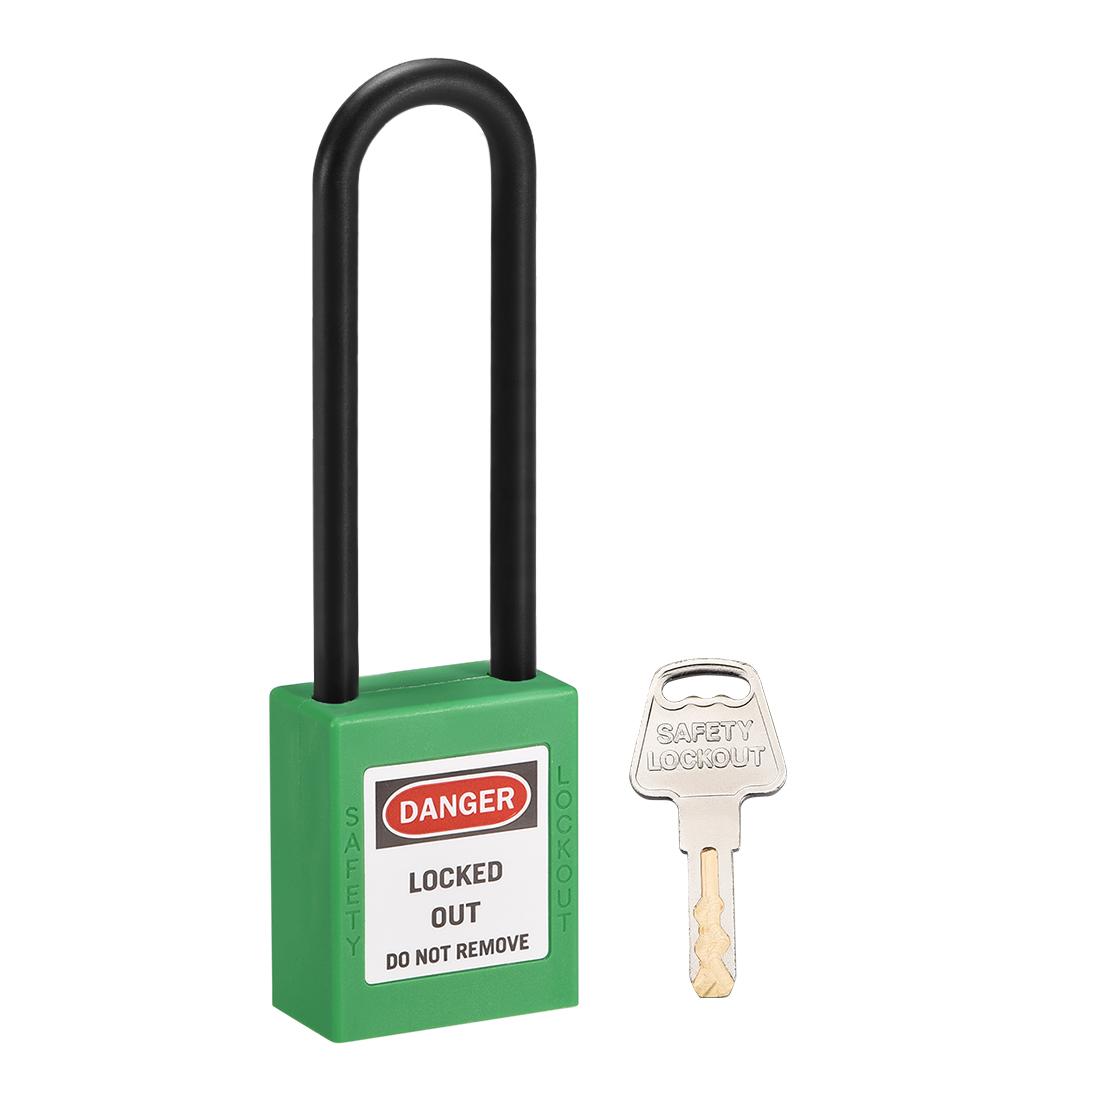 Lockout Tagout Locks 3 Inch Shackle Key Alike Safety Padlock Plastic Light Green